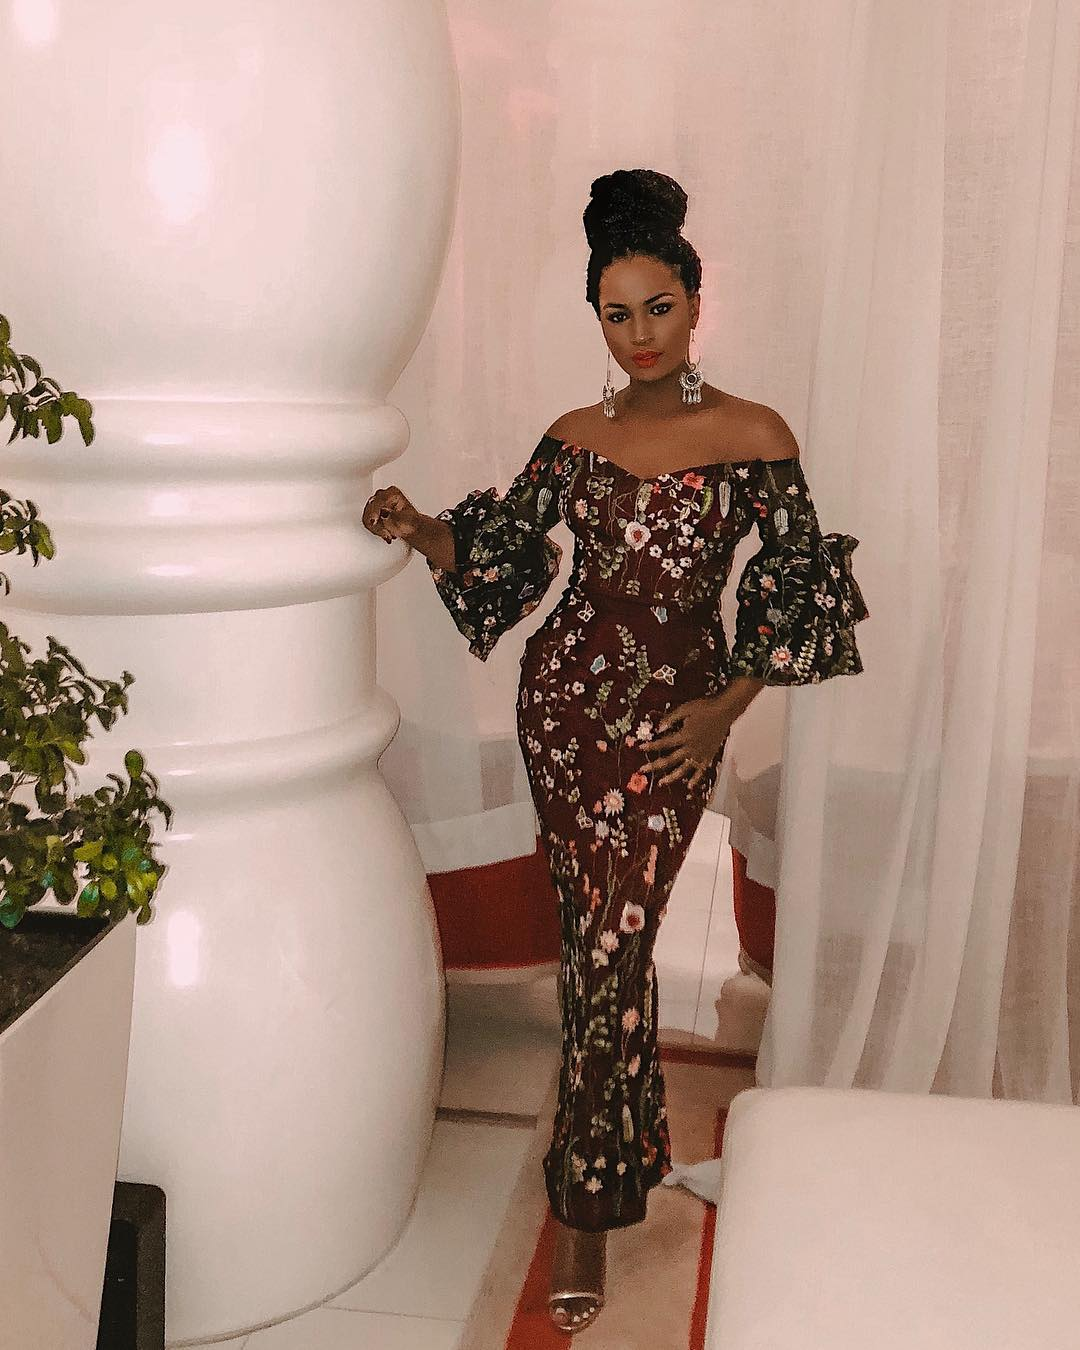 fablane by derin kenyan blogger fashion